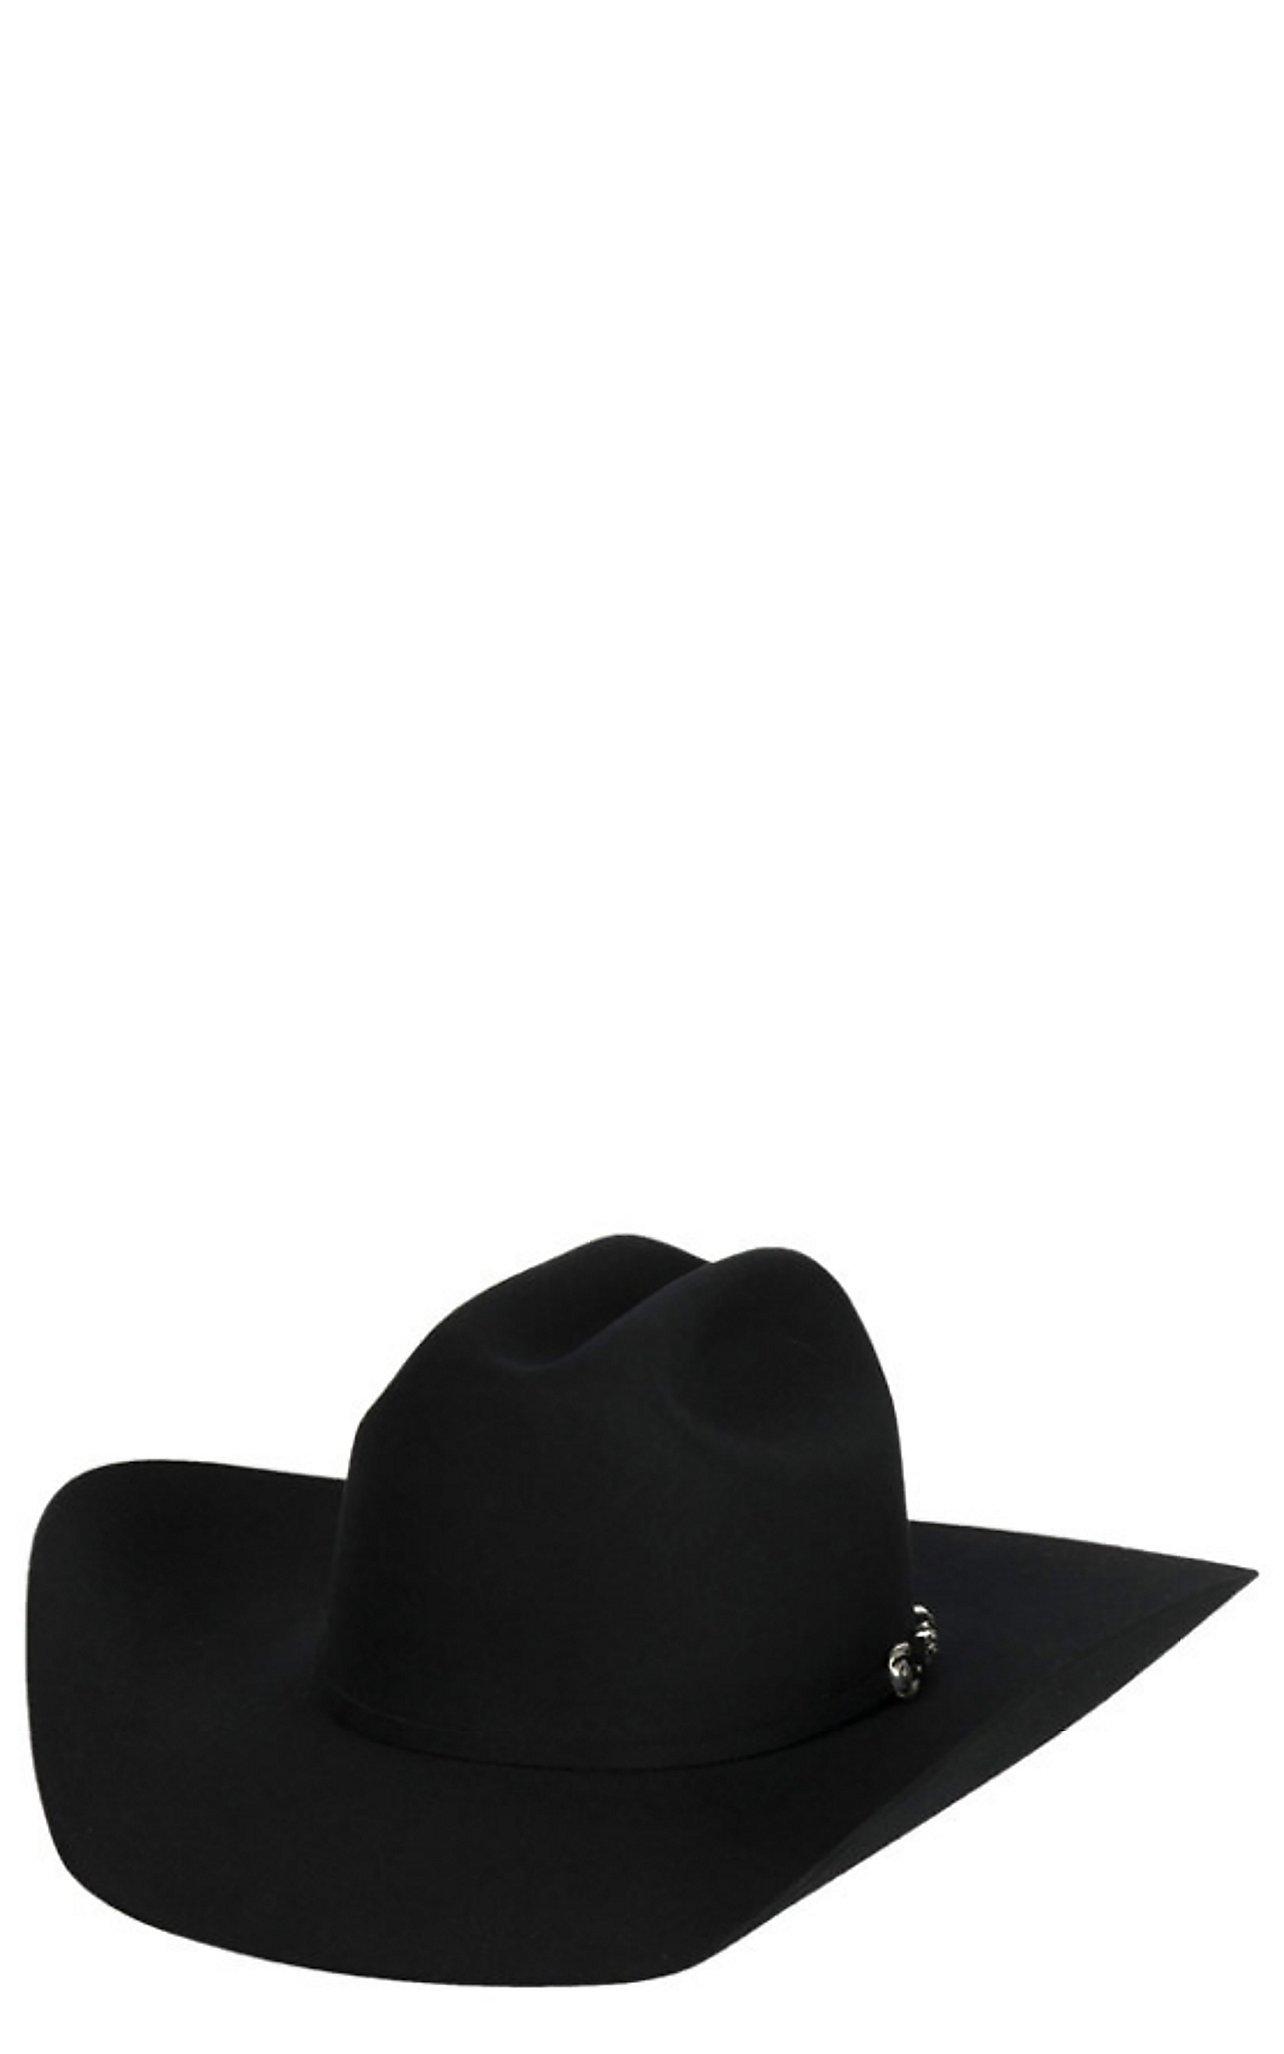 Resistol 6X George Strait Collection Ox Bow Black Felt Cowboy Hat 33b922e160a